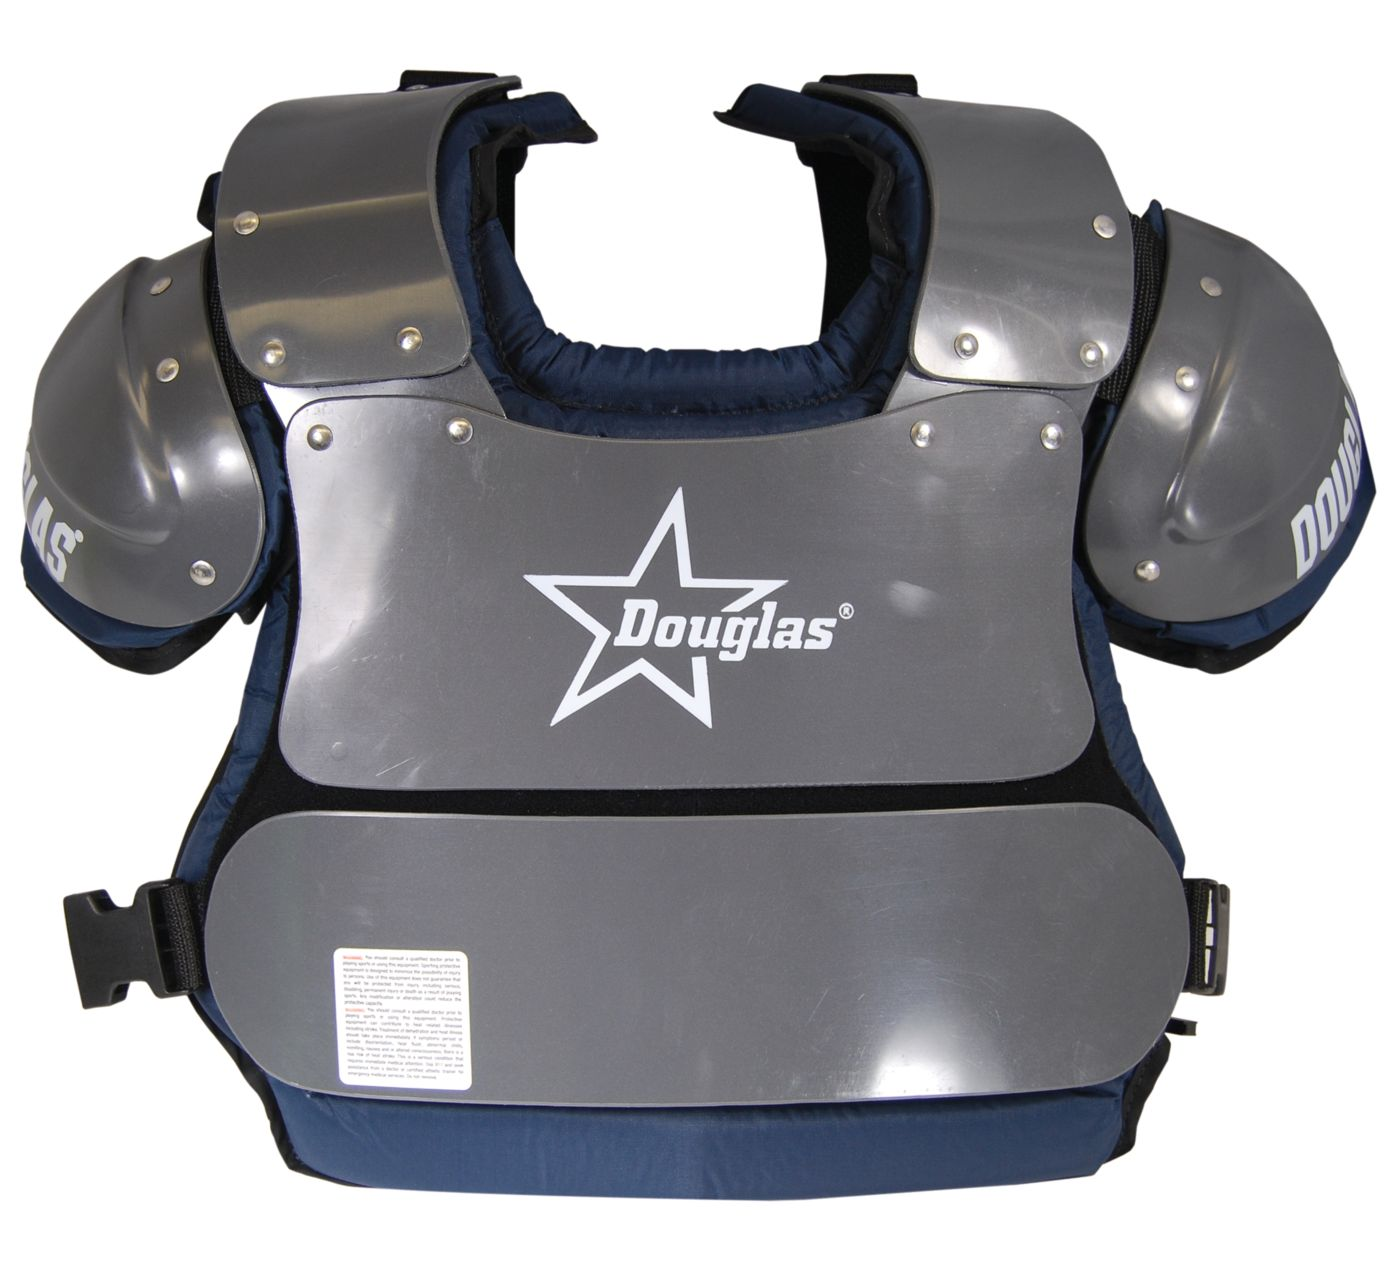 Douglas Adult Umpire Chest Protector